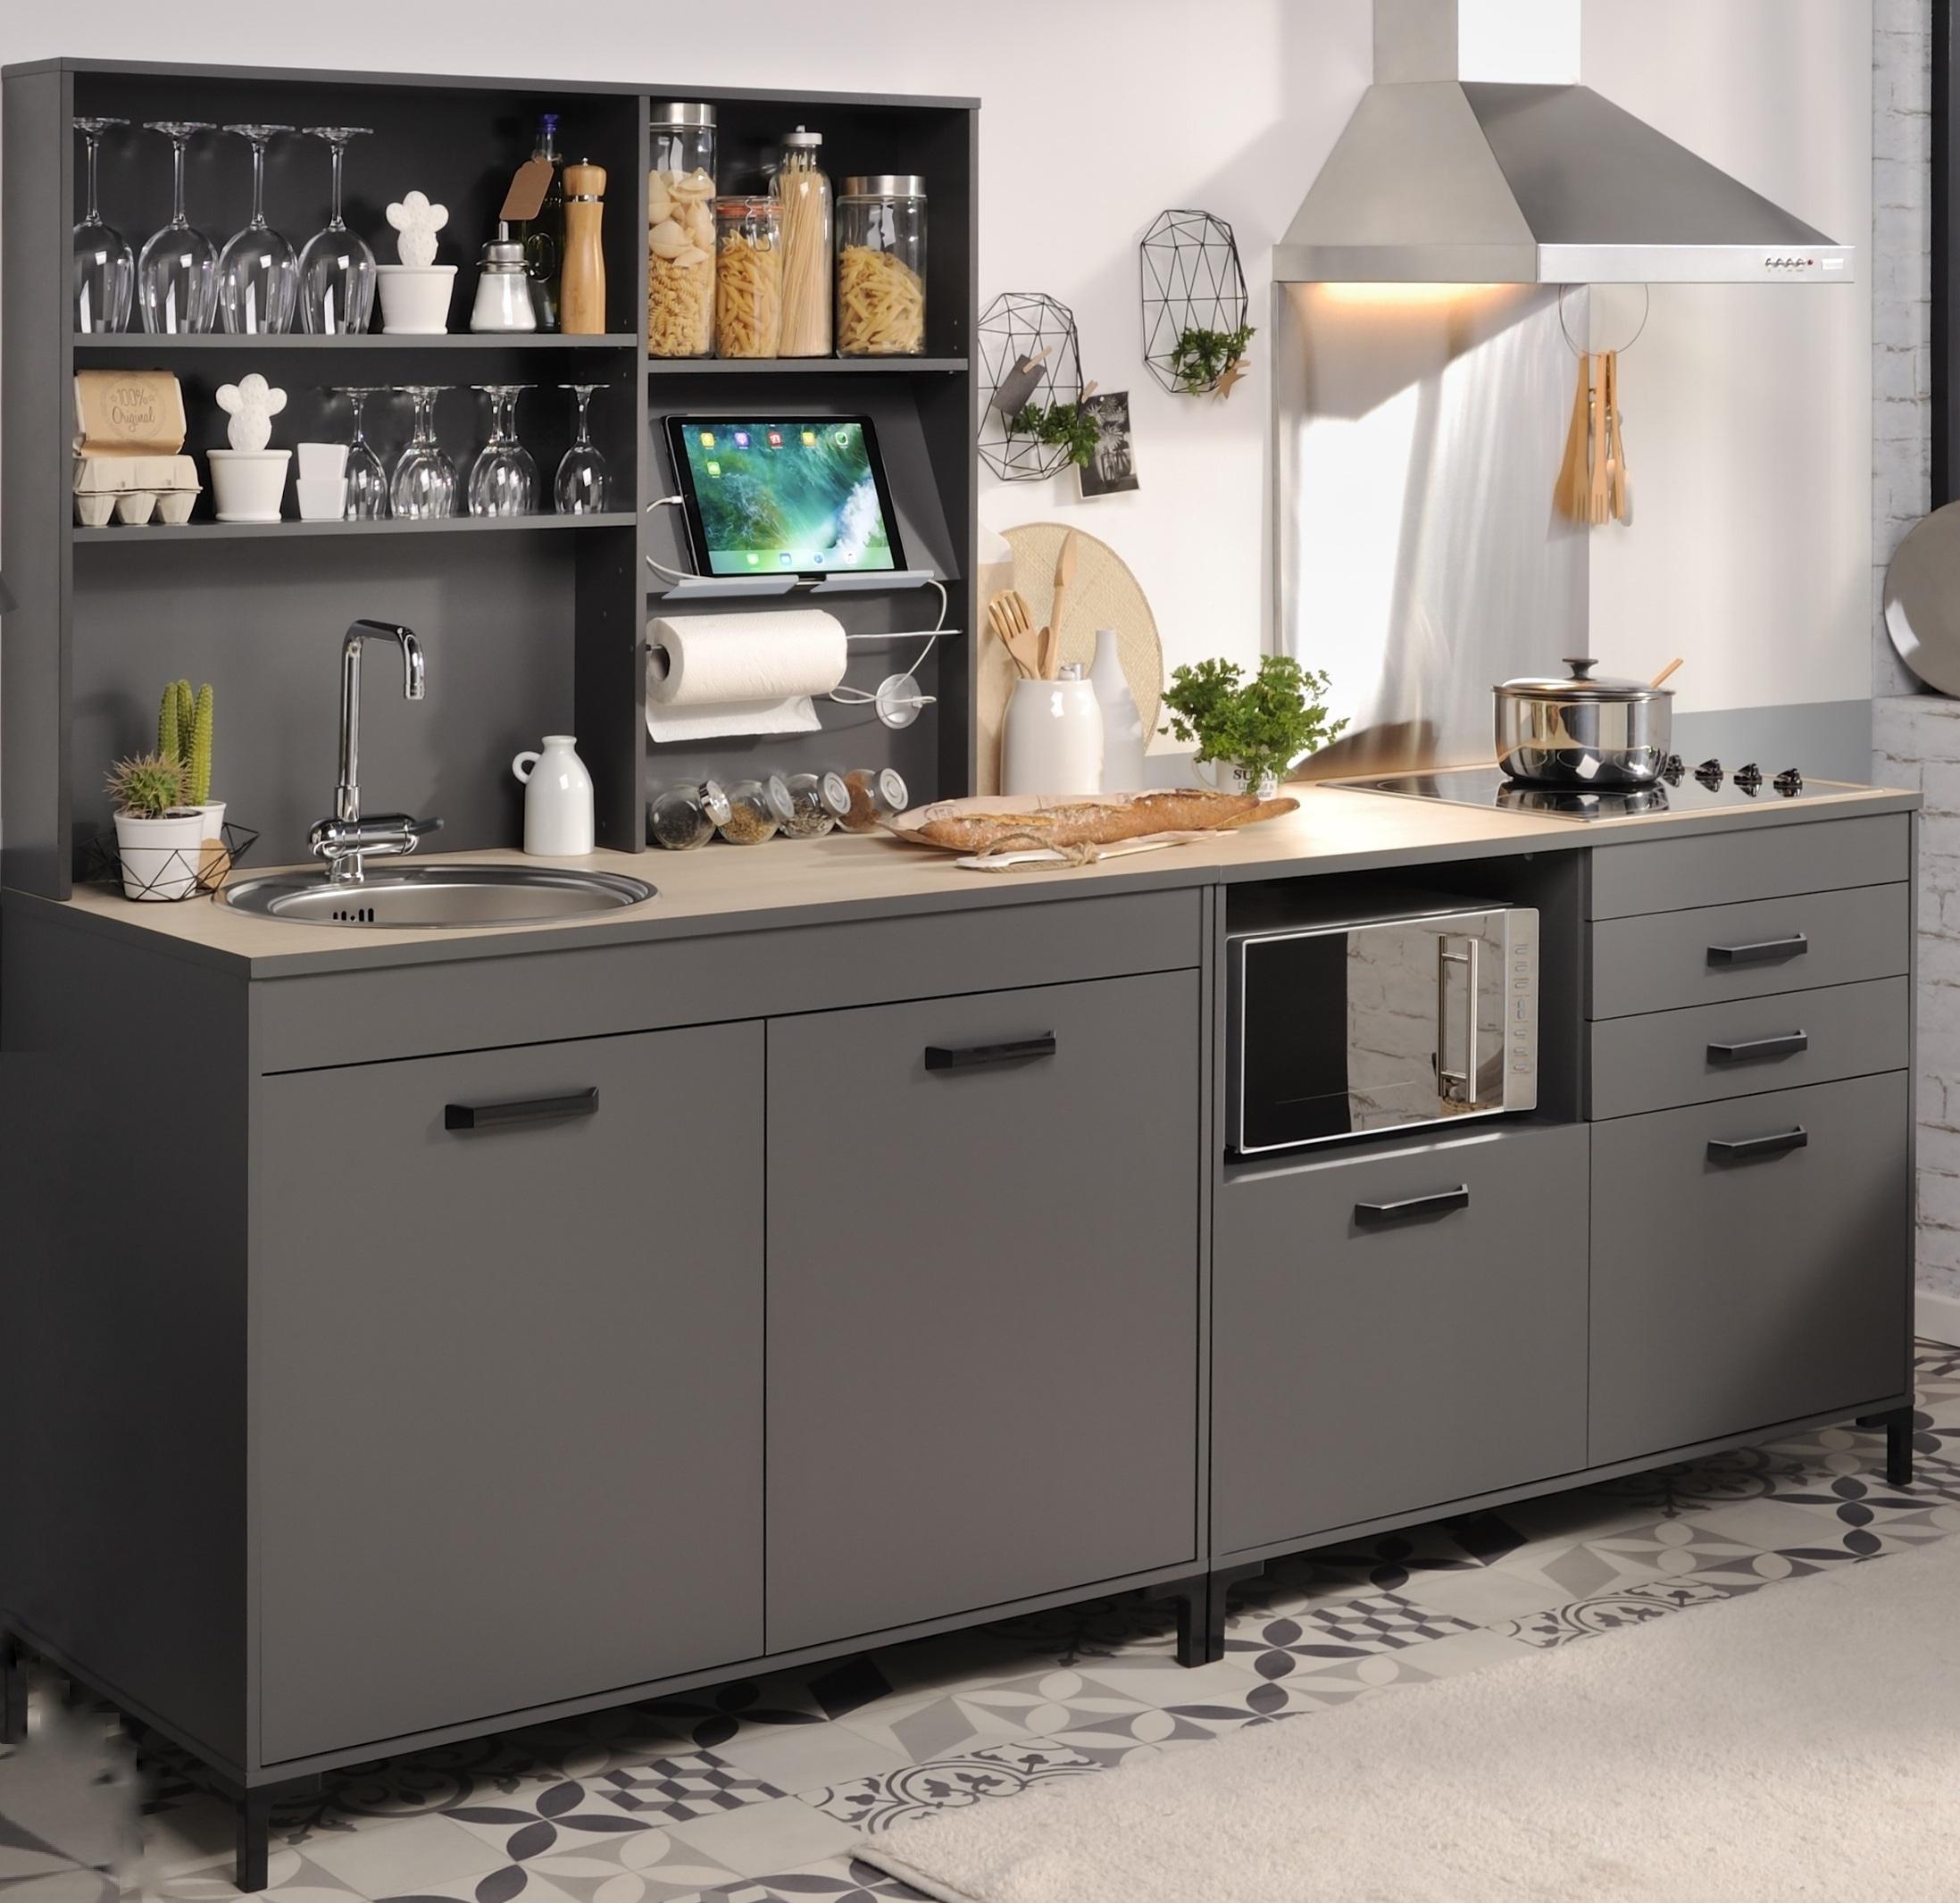 Full Size of Moove Küche Einbauküche Mit E Geräten